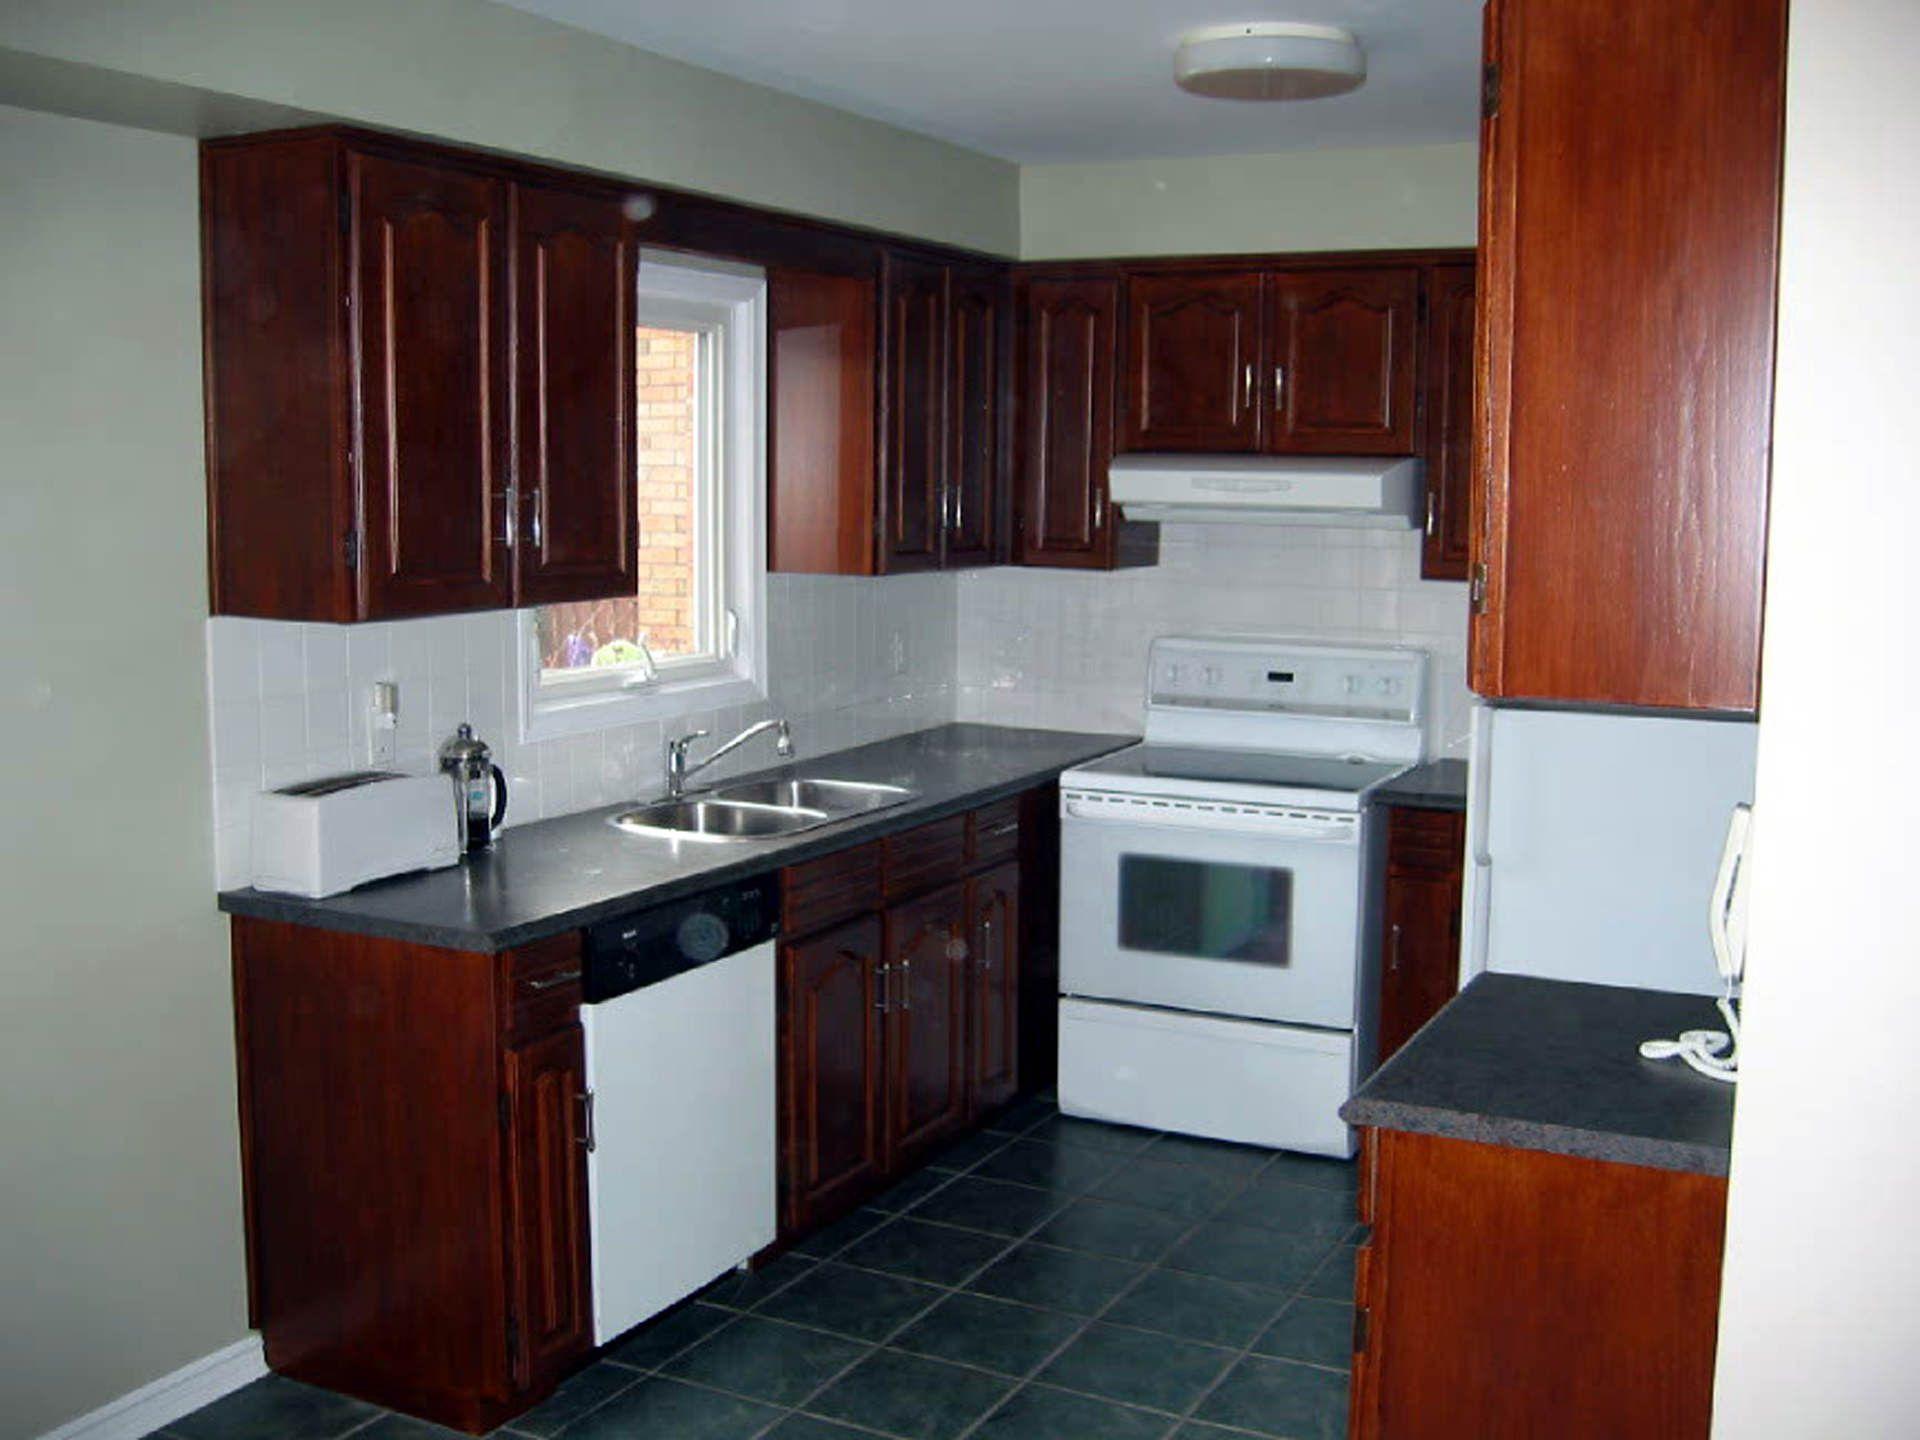 Ideas of Restaining Kitchen Cabinets | Kitchen cabinet ...